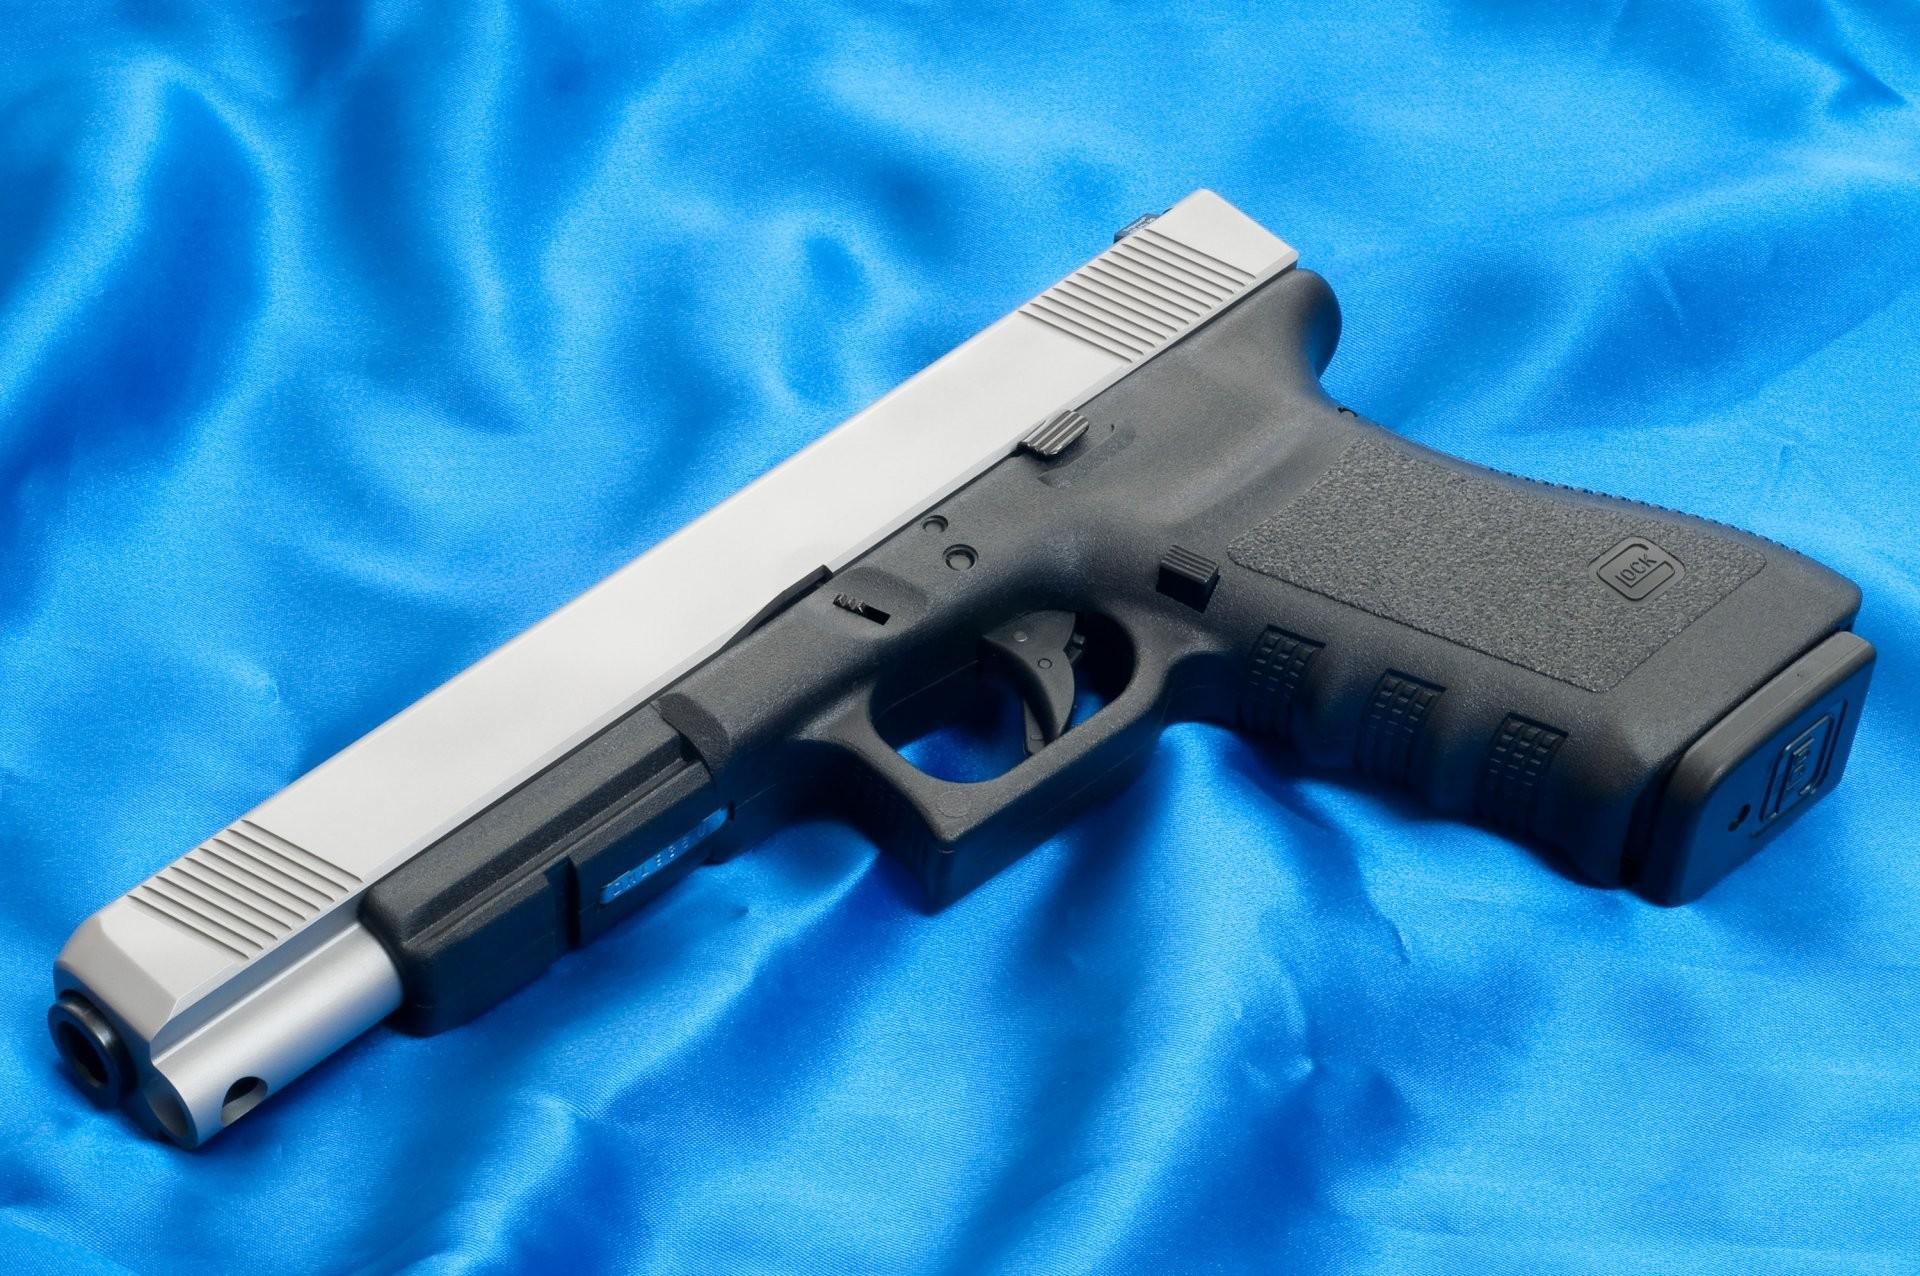 glock 20l gun weapons wallpapers austria glock 20l gun weapon wallpaper  canvas blue background